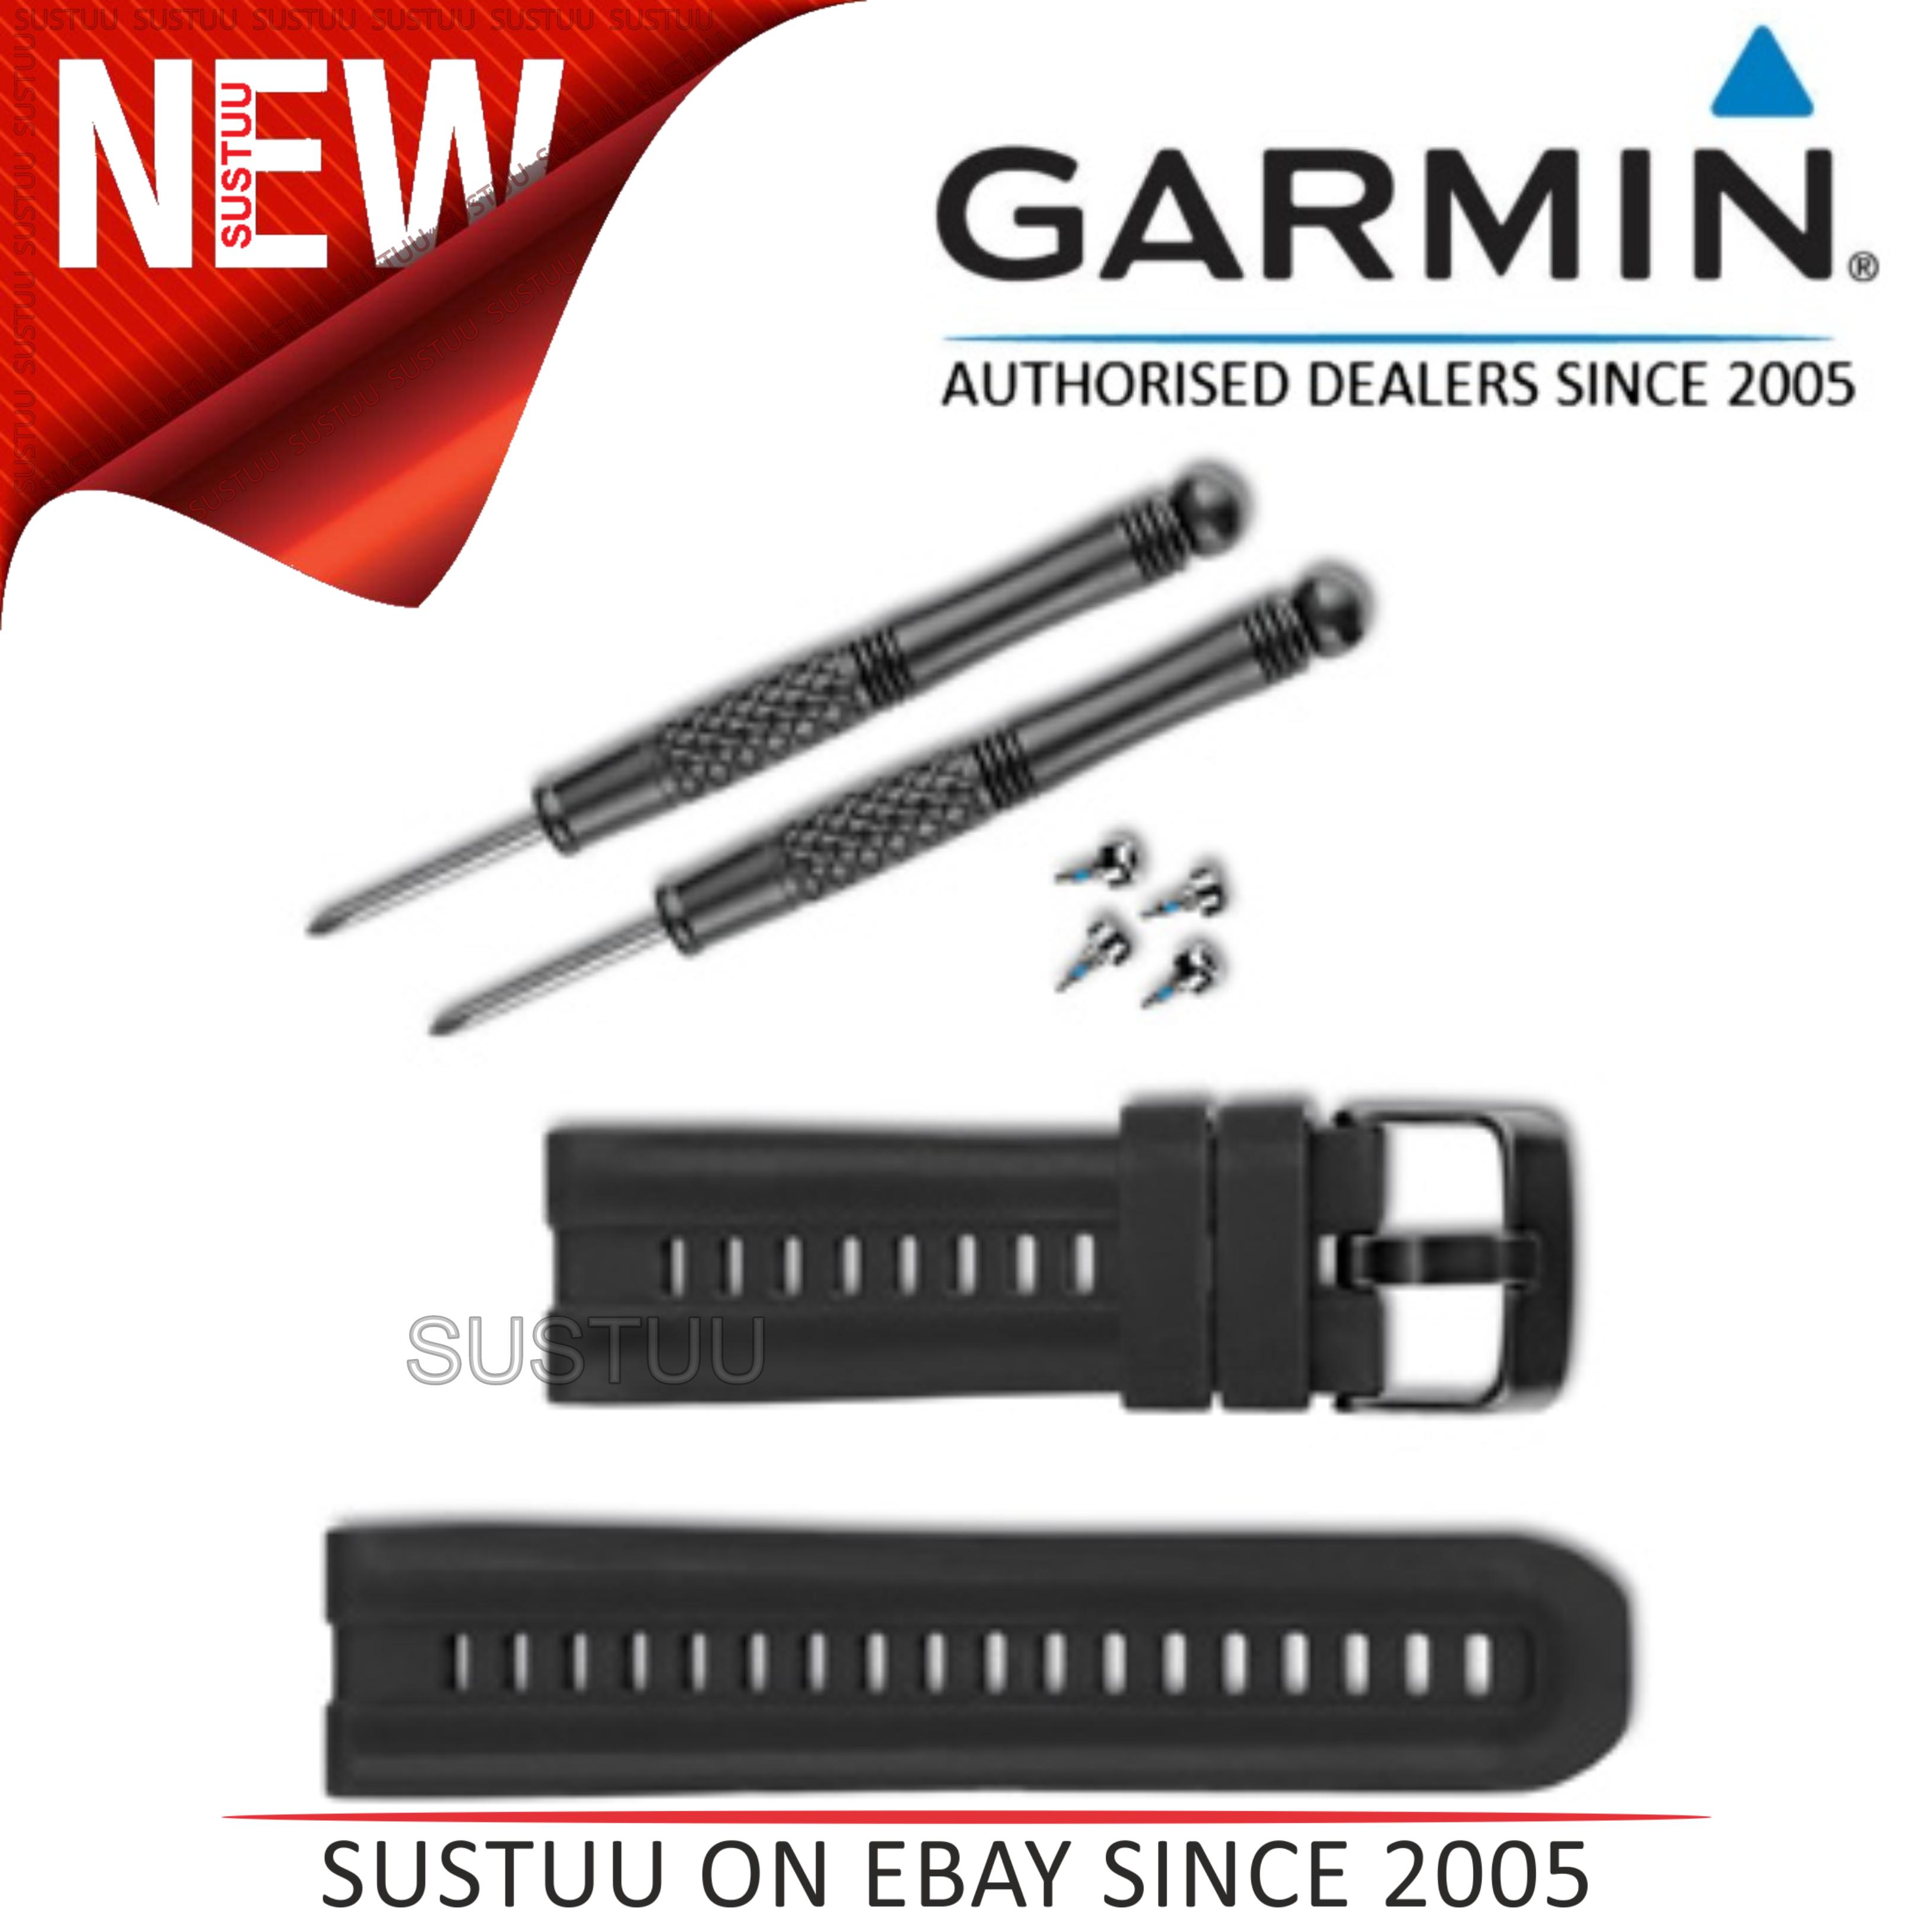 Garmin Replacement Watch Strap Band|For Fenix 2 Quatix D2 tactix|Silicone Black